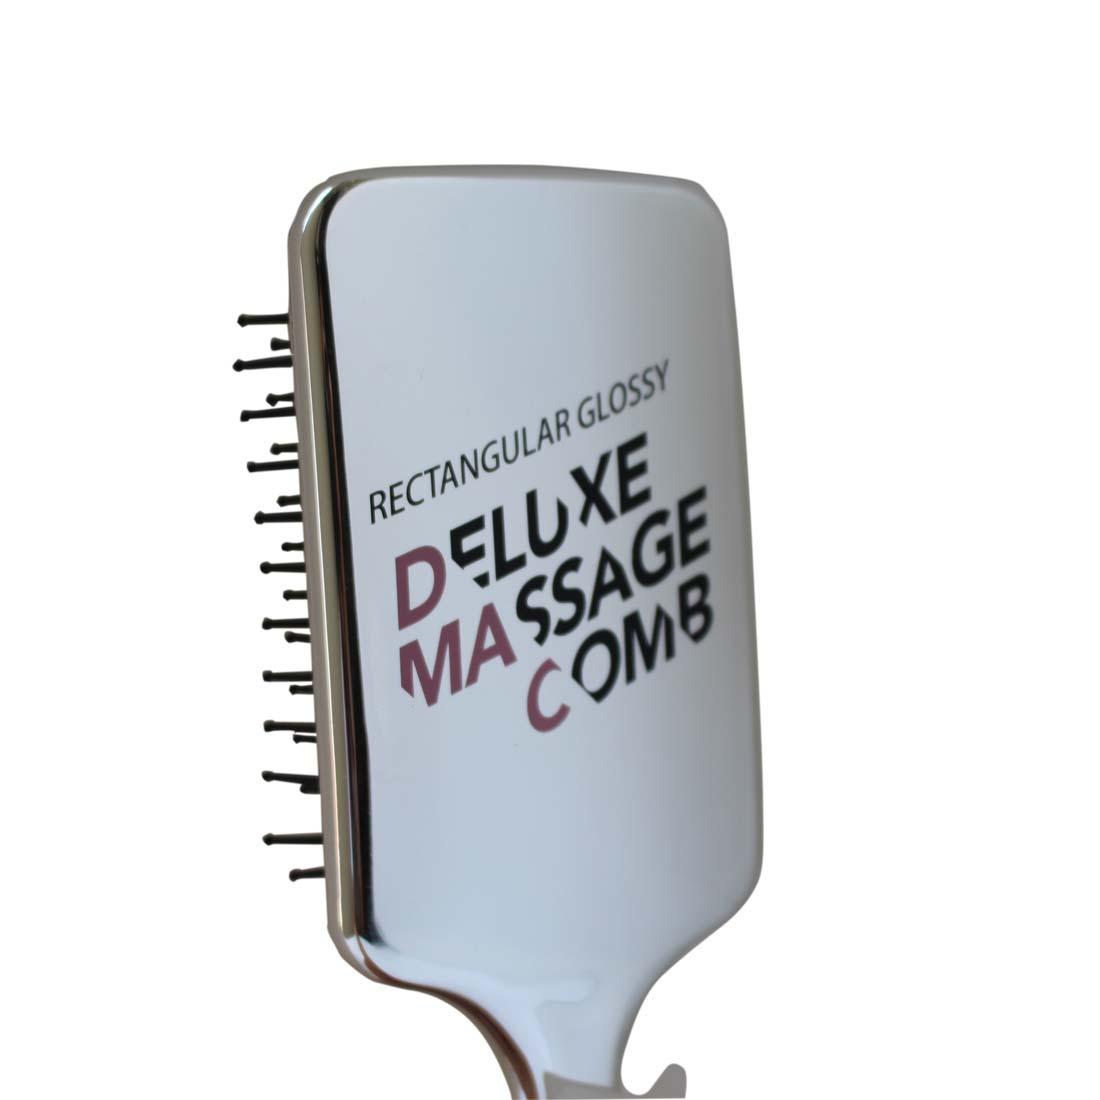 Lược massage hình chữ nhật  MINISO RETANGULAR GLOSSY DELUXE MASSAGE COMB  - MNS029